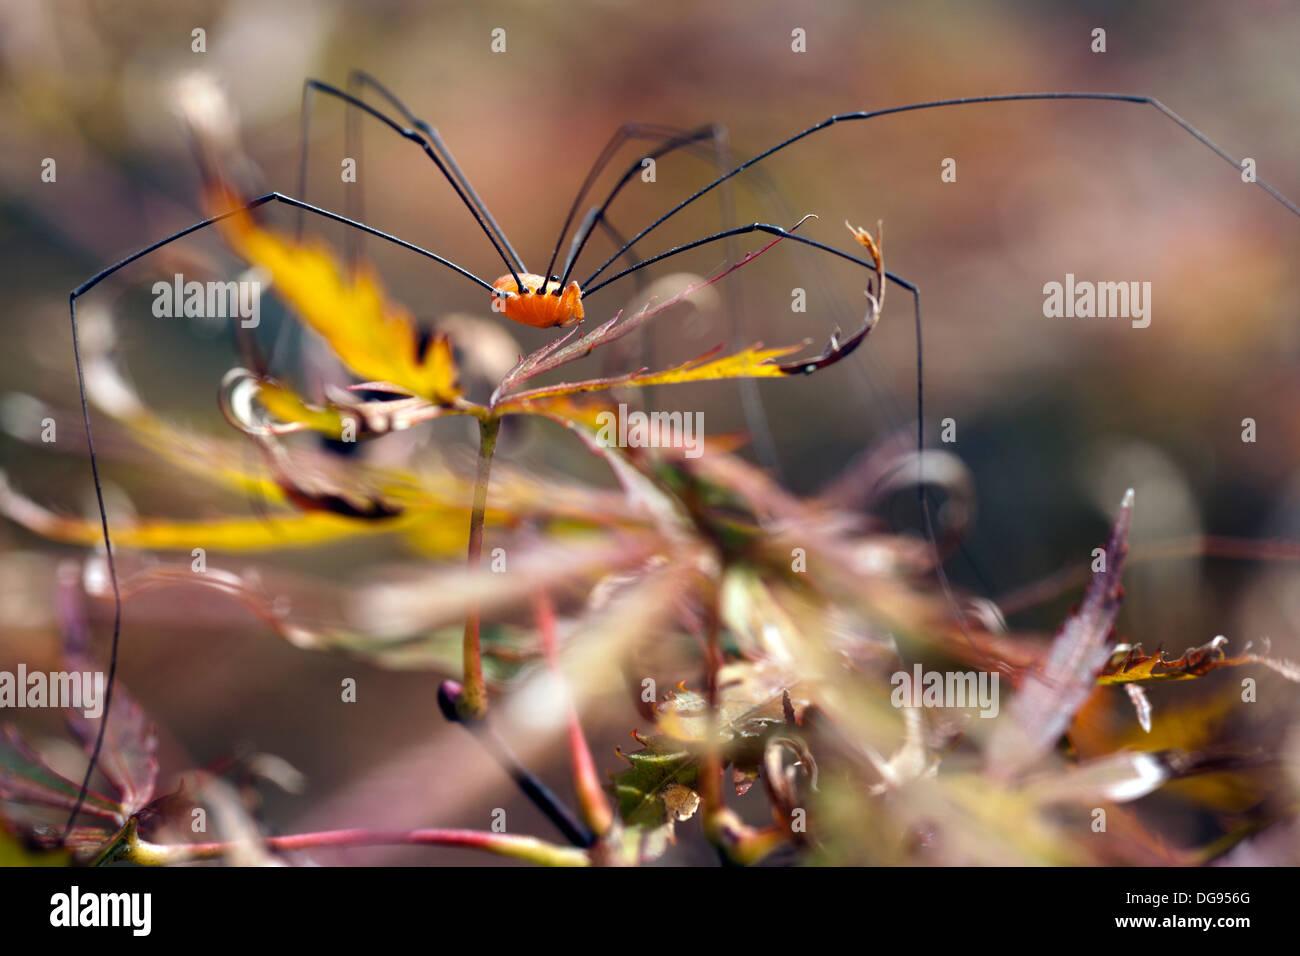 Harvestmen Spider - Brevard, North Carolina USA - Stock Image